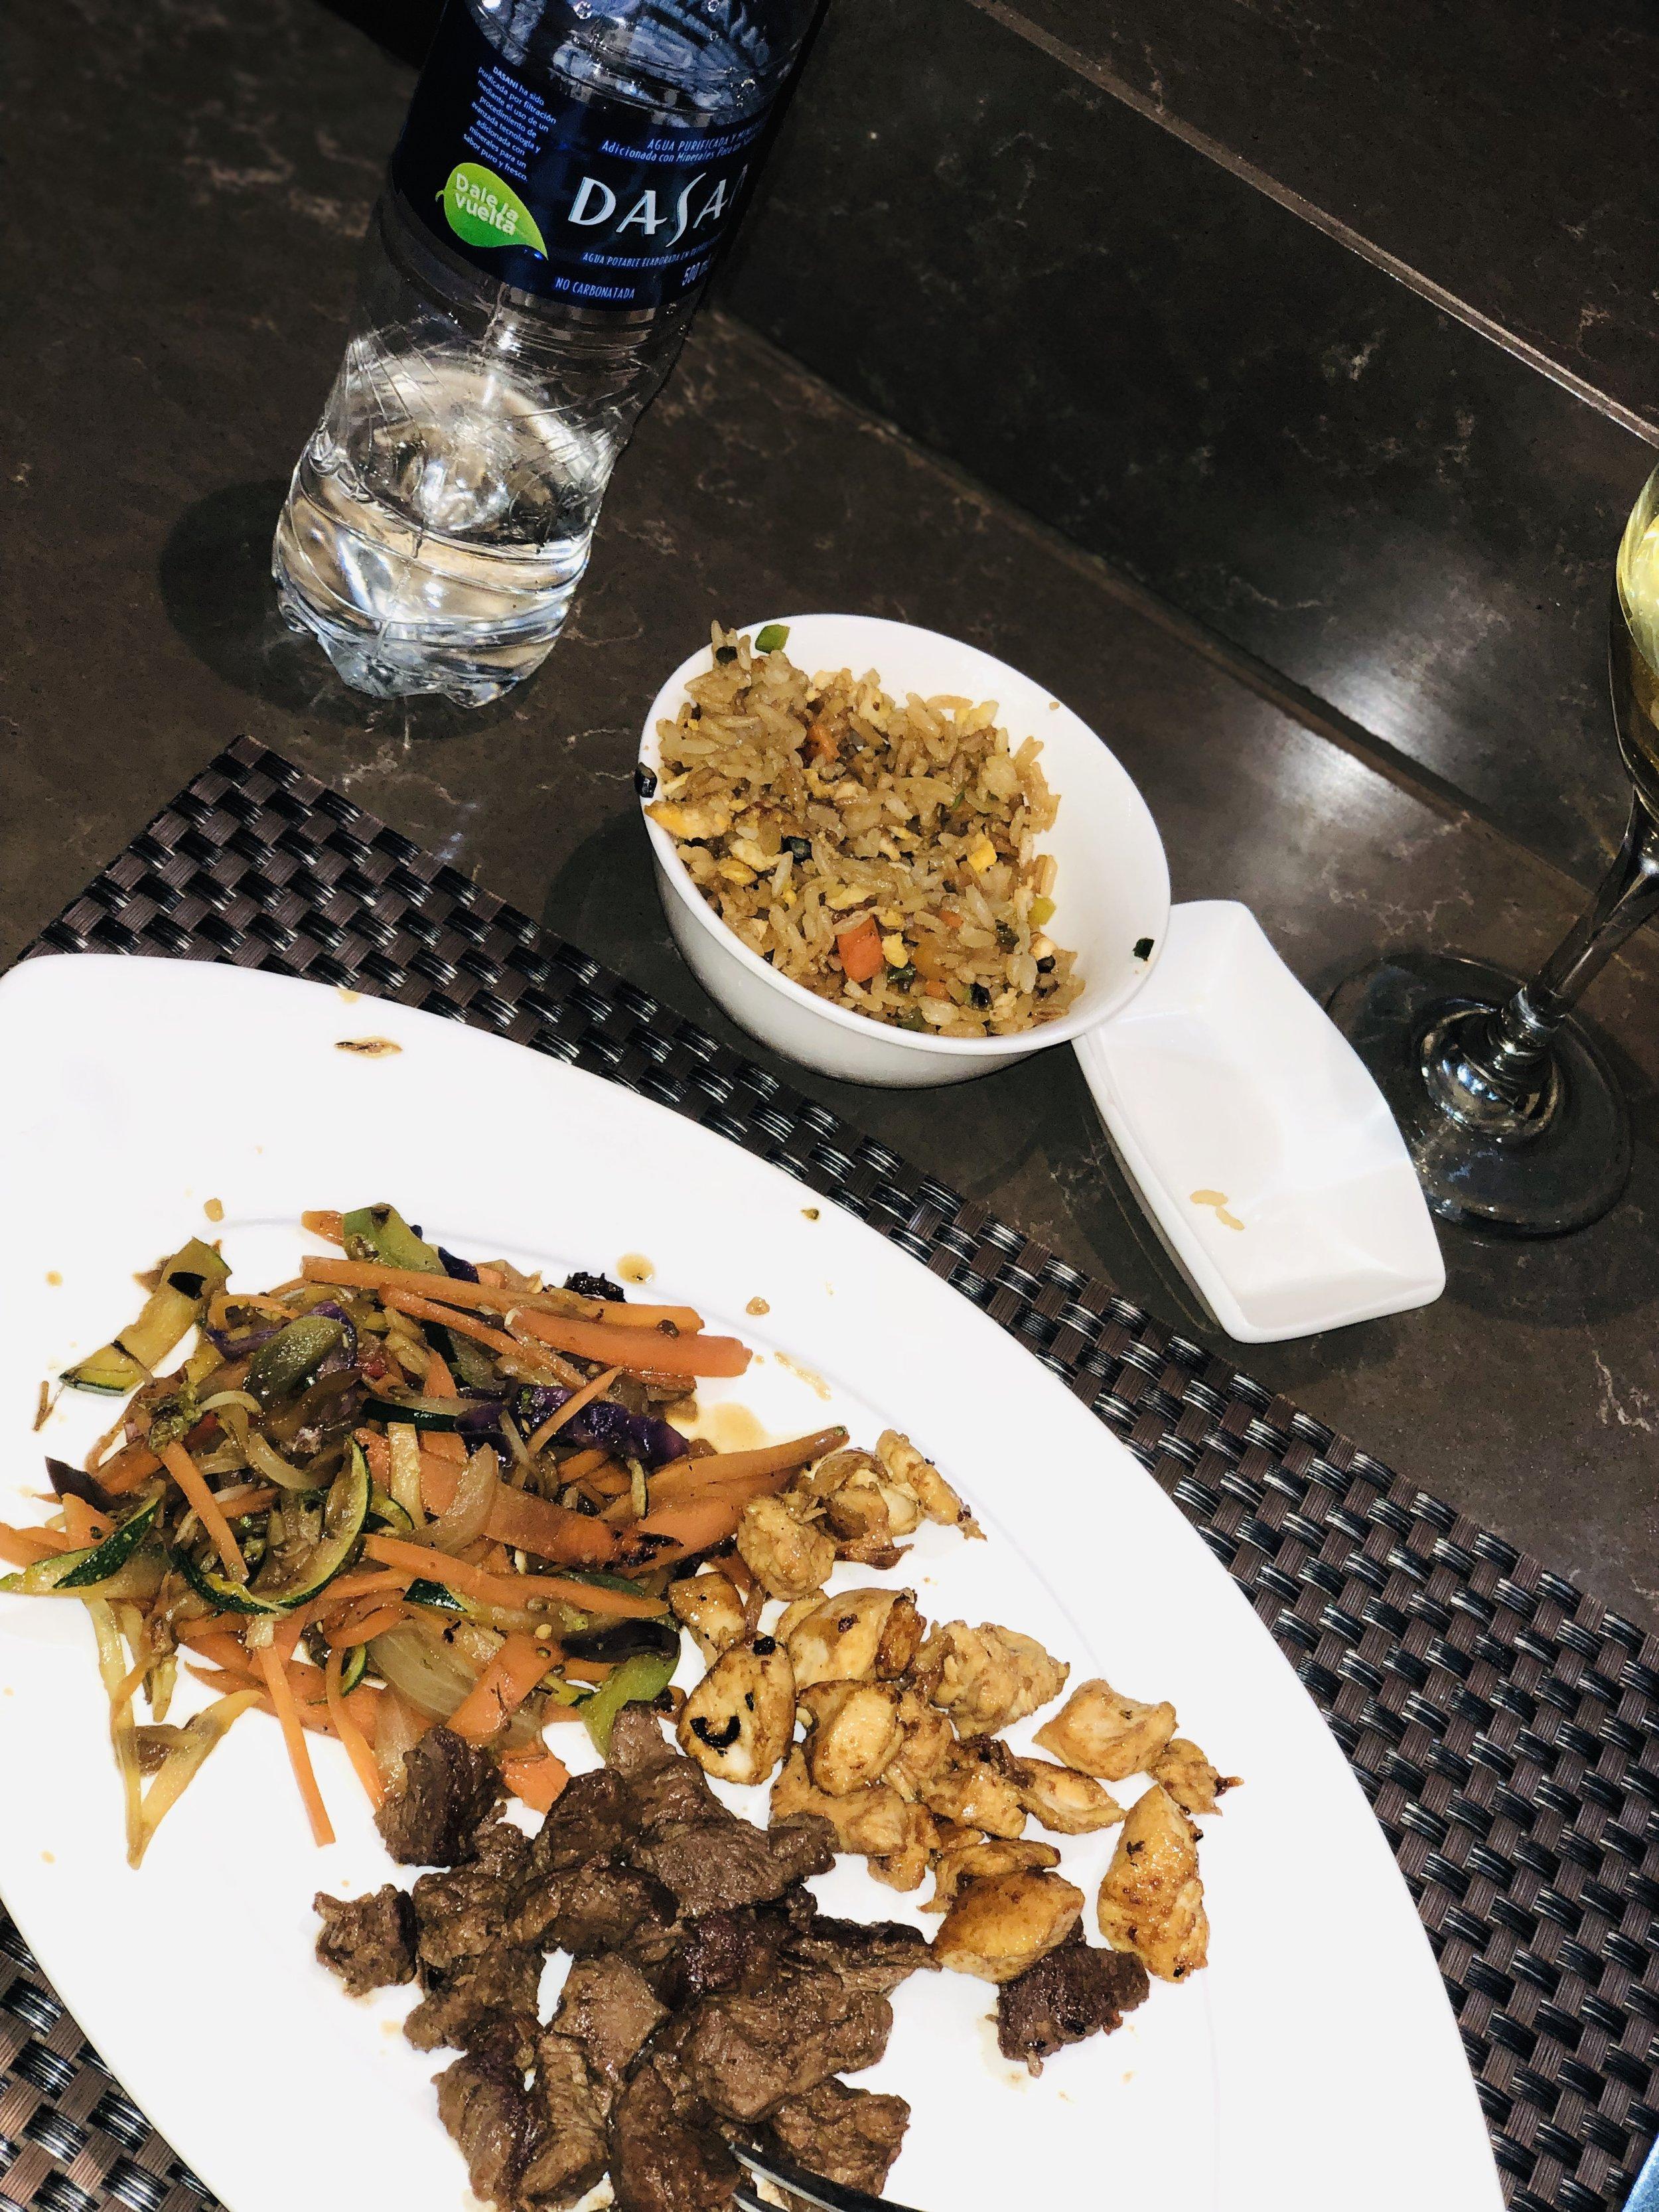 Hibachi: Must make a reservation